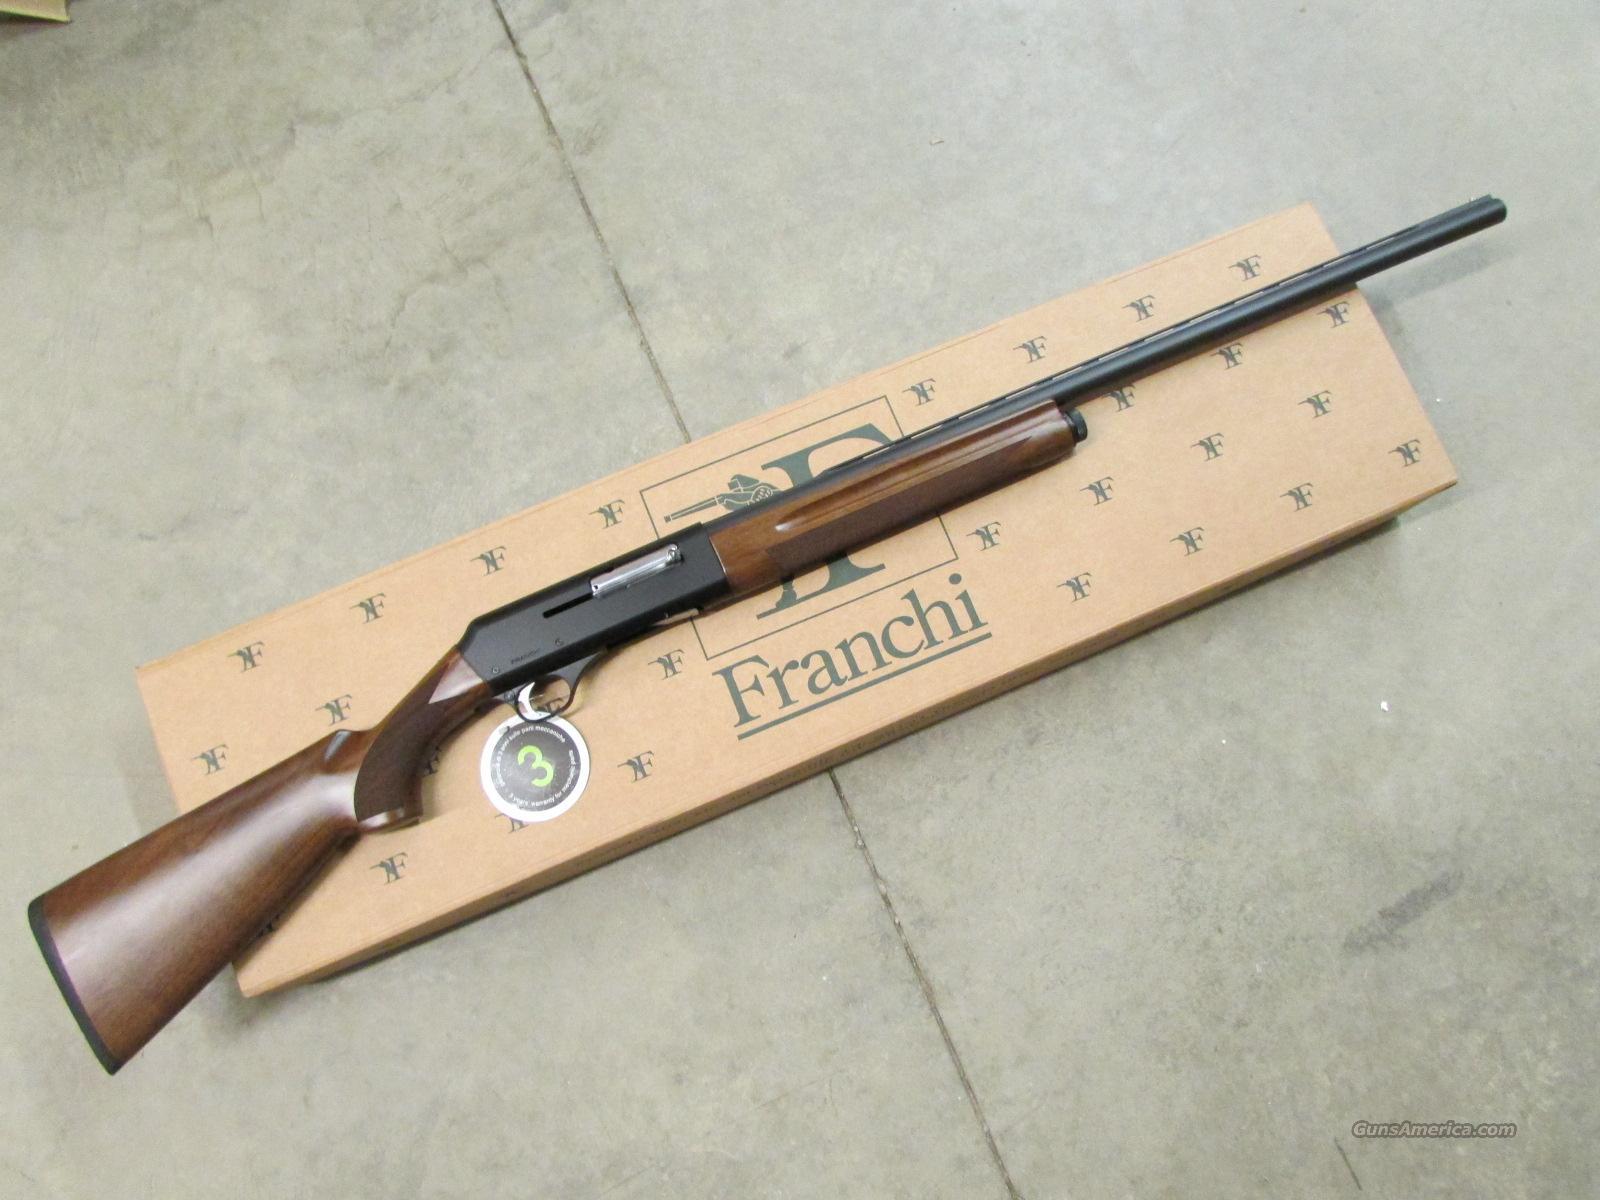 "Franchi 48 AL Semi-Auto 20 Gauge 28"" With Choke... For Sale"